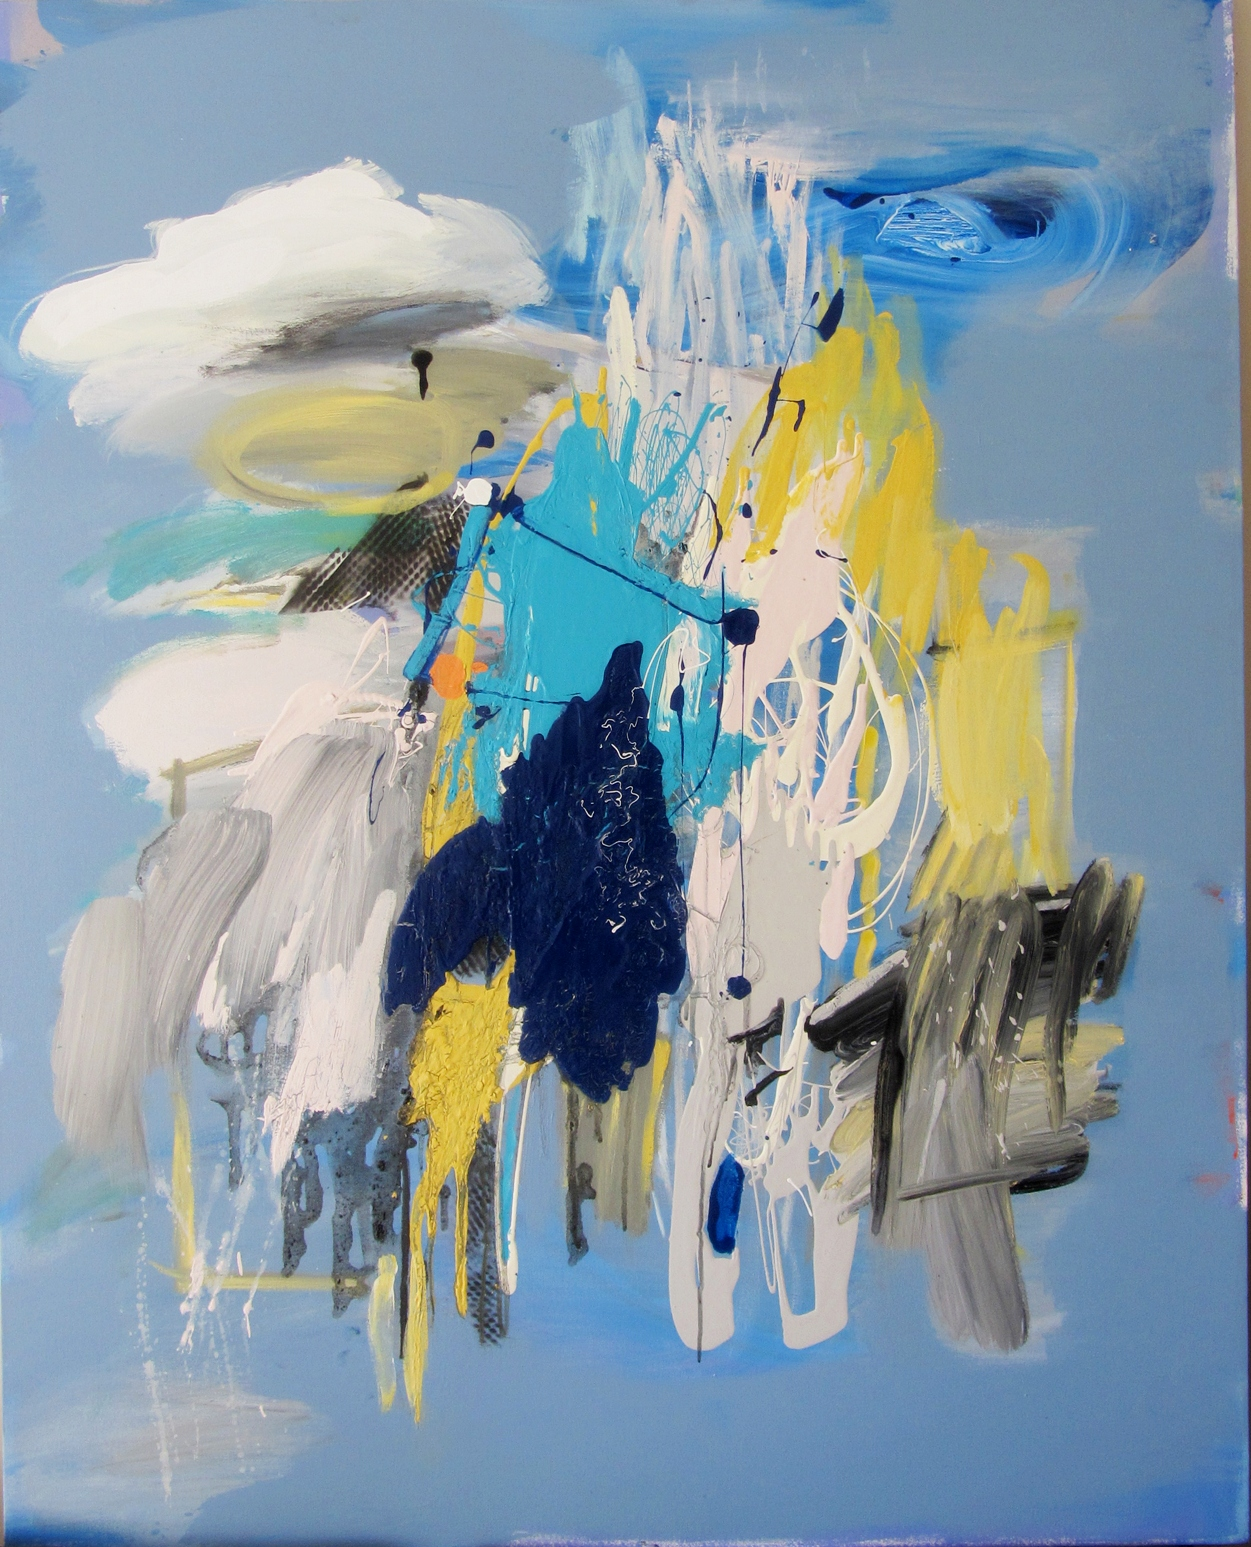 Abstract Merit_Leonie Richardson - Summer rain shower